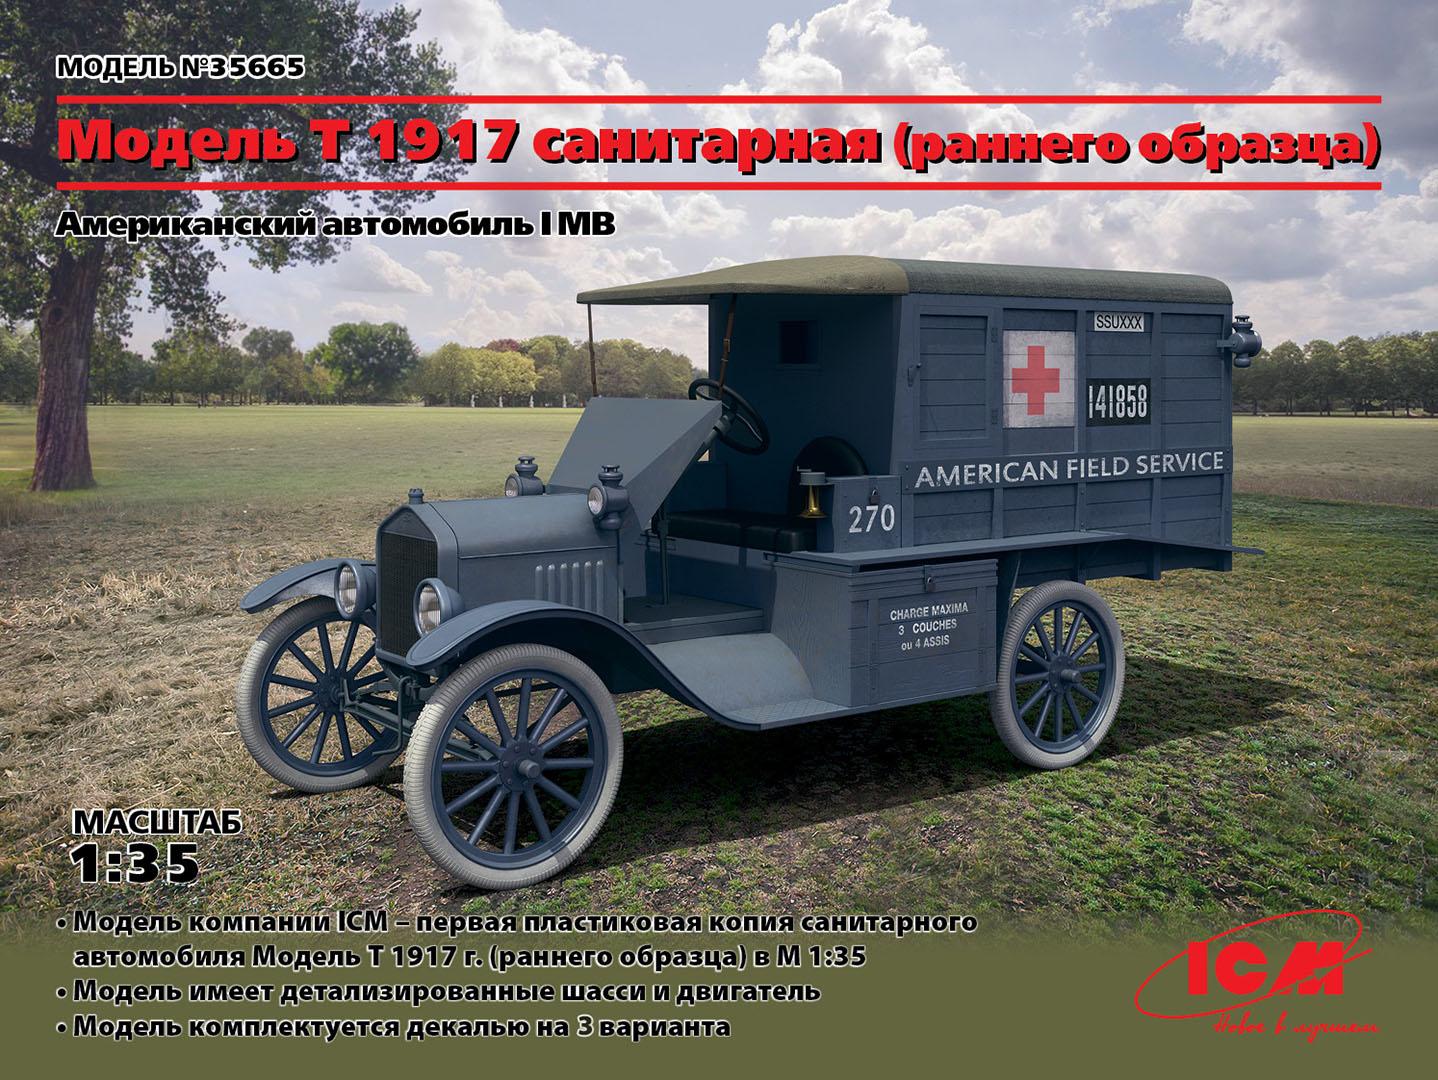 35665_Ru1